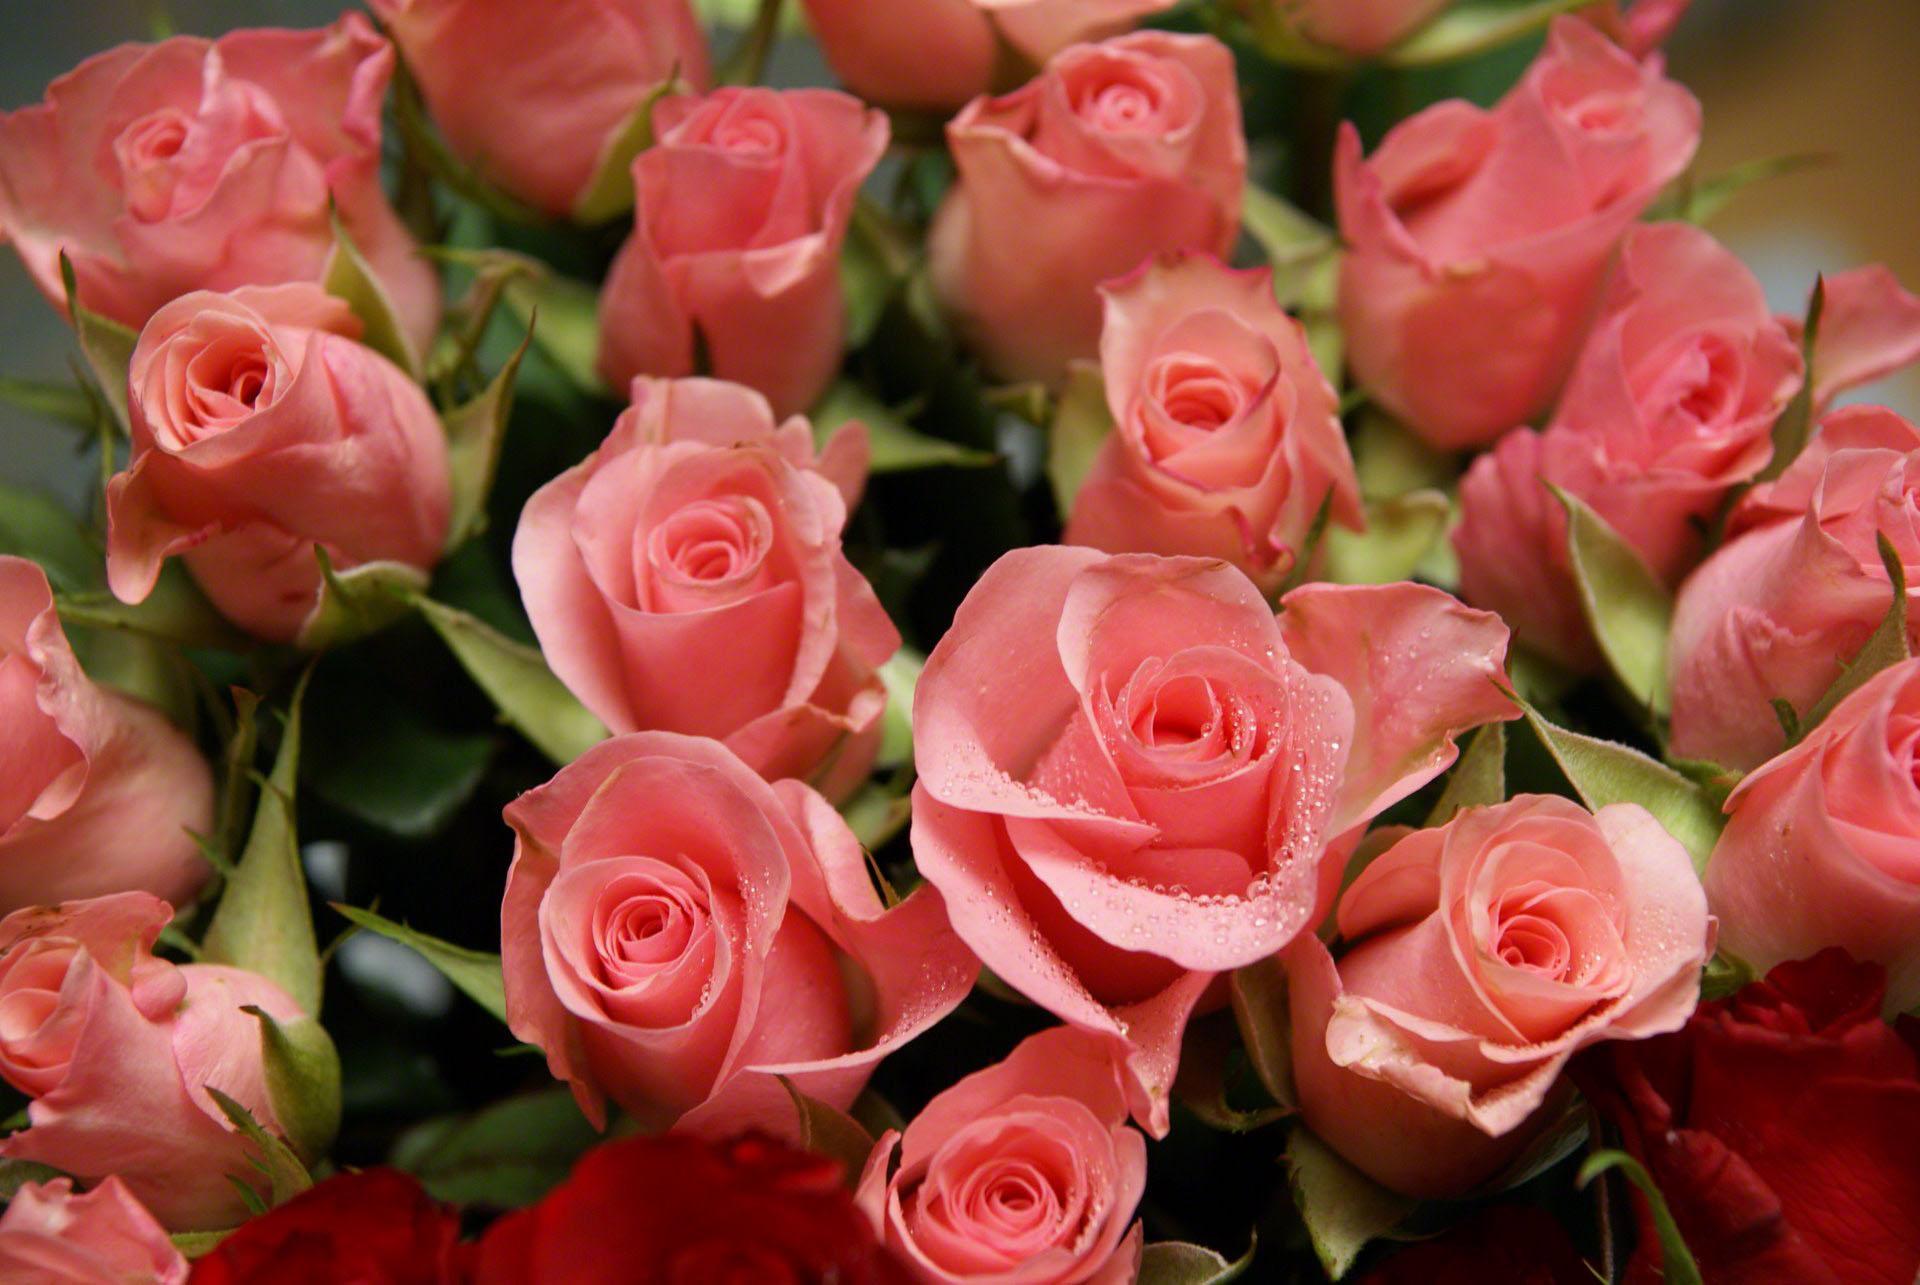 http://www.fabiovisentin.com/photography/photo/12/pink-roses-01645.jpg